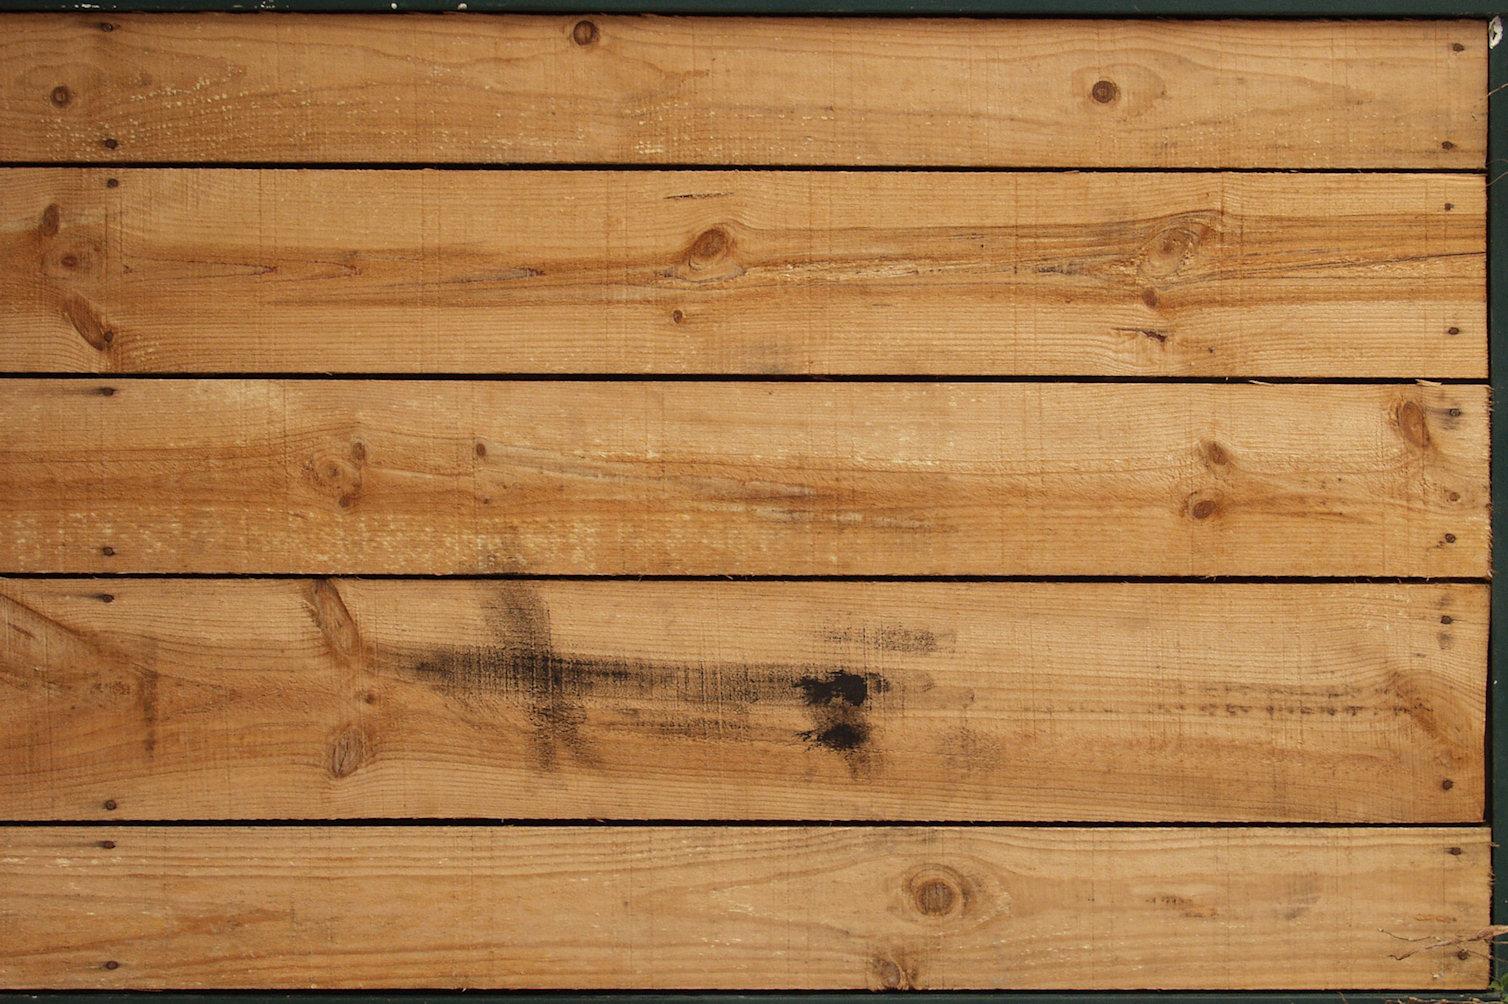 wood planks texture 1508x1004